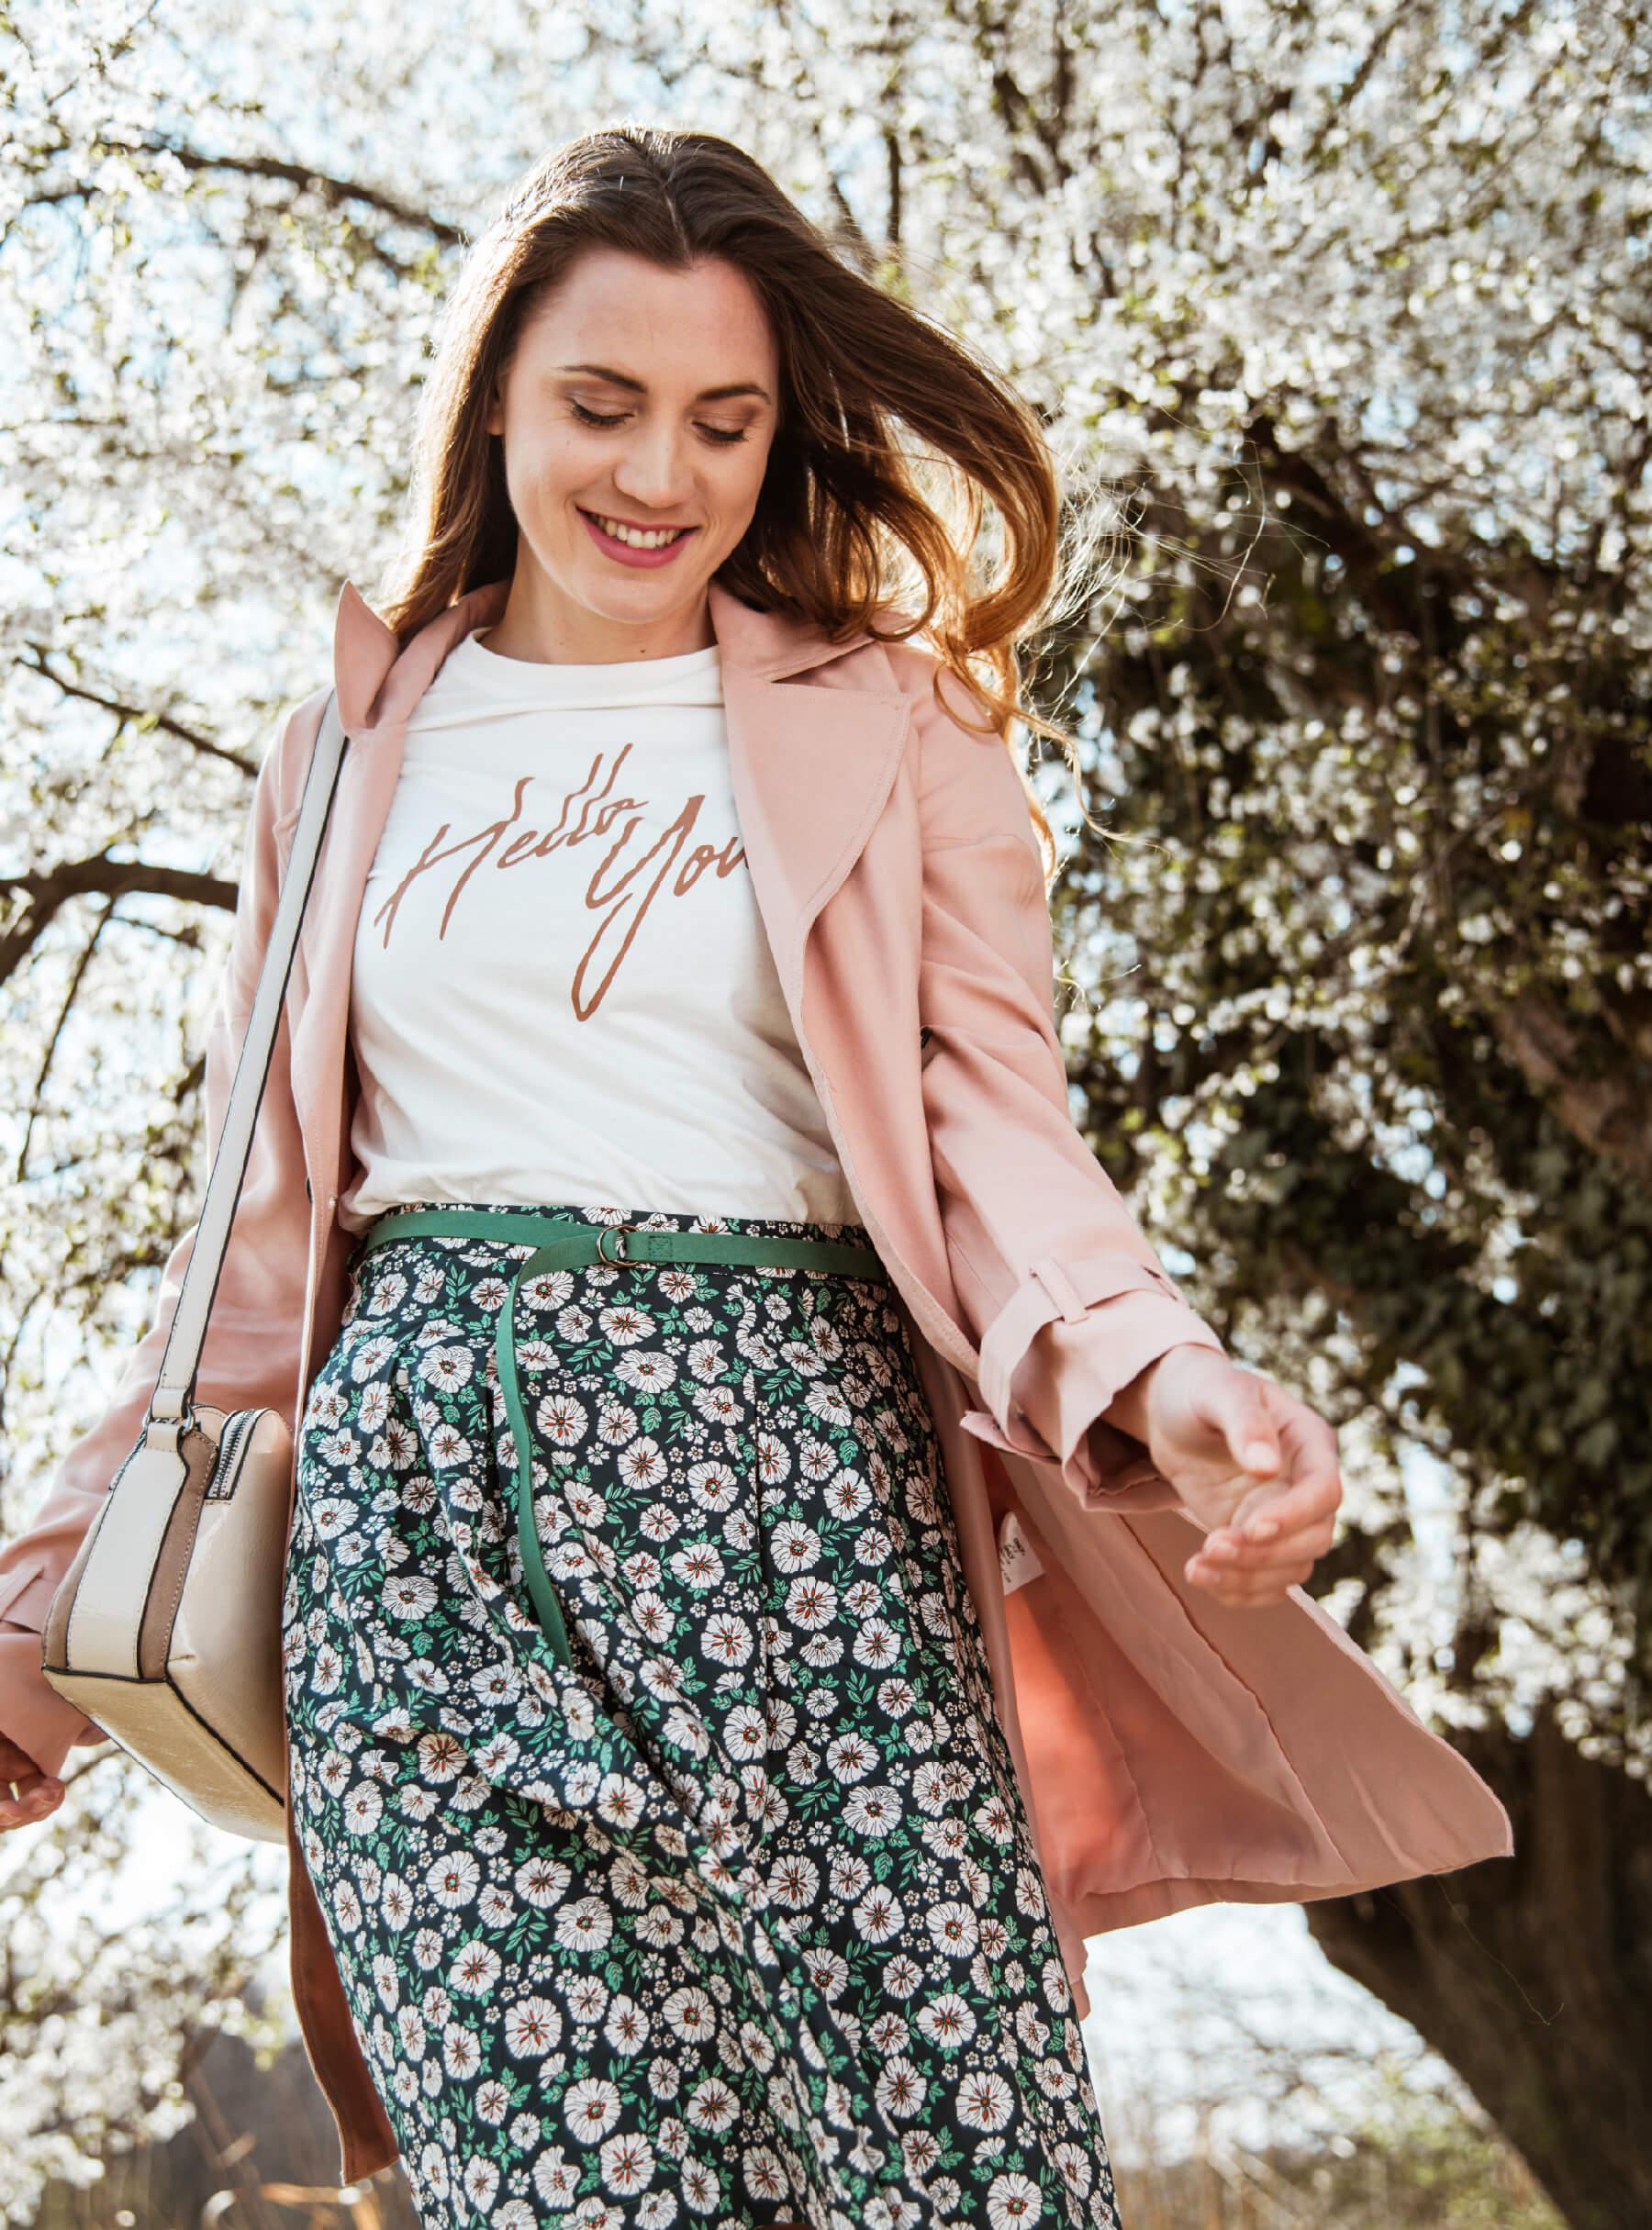 Majica Vero Moda1,799rsd Suknja Esprit7,999rsd  Torbica Parfois3,799rsd